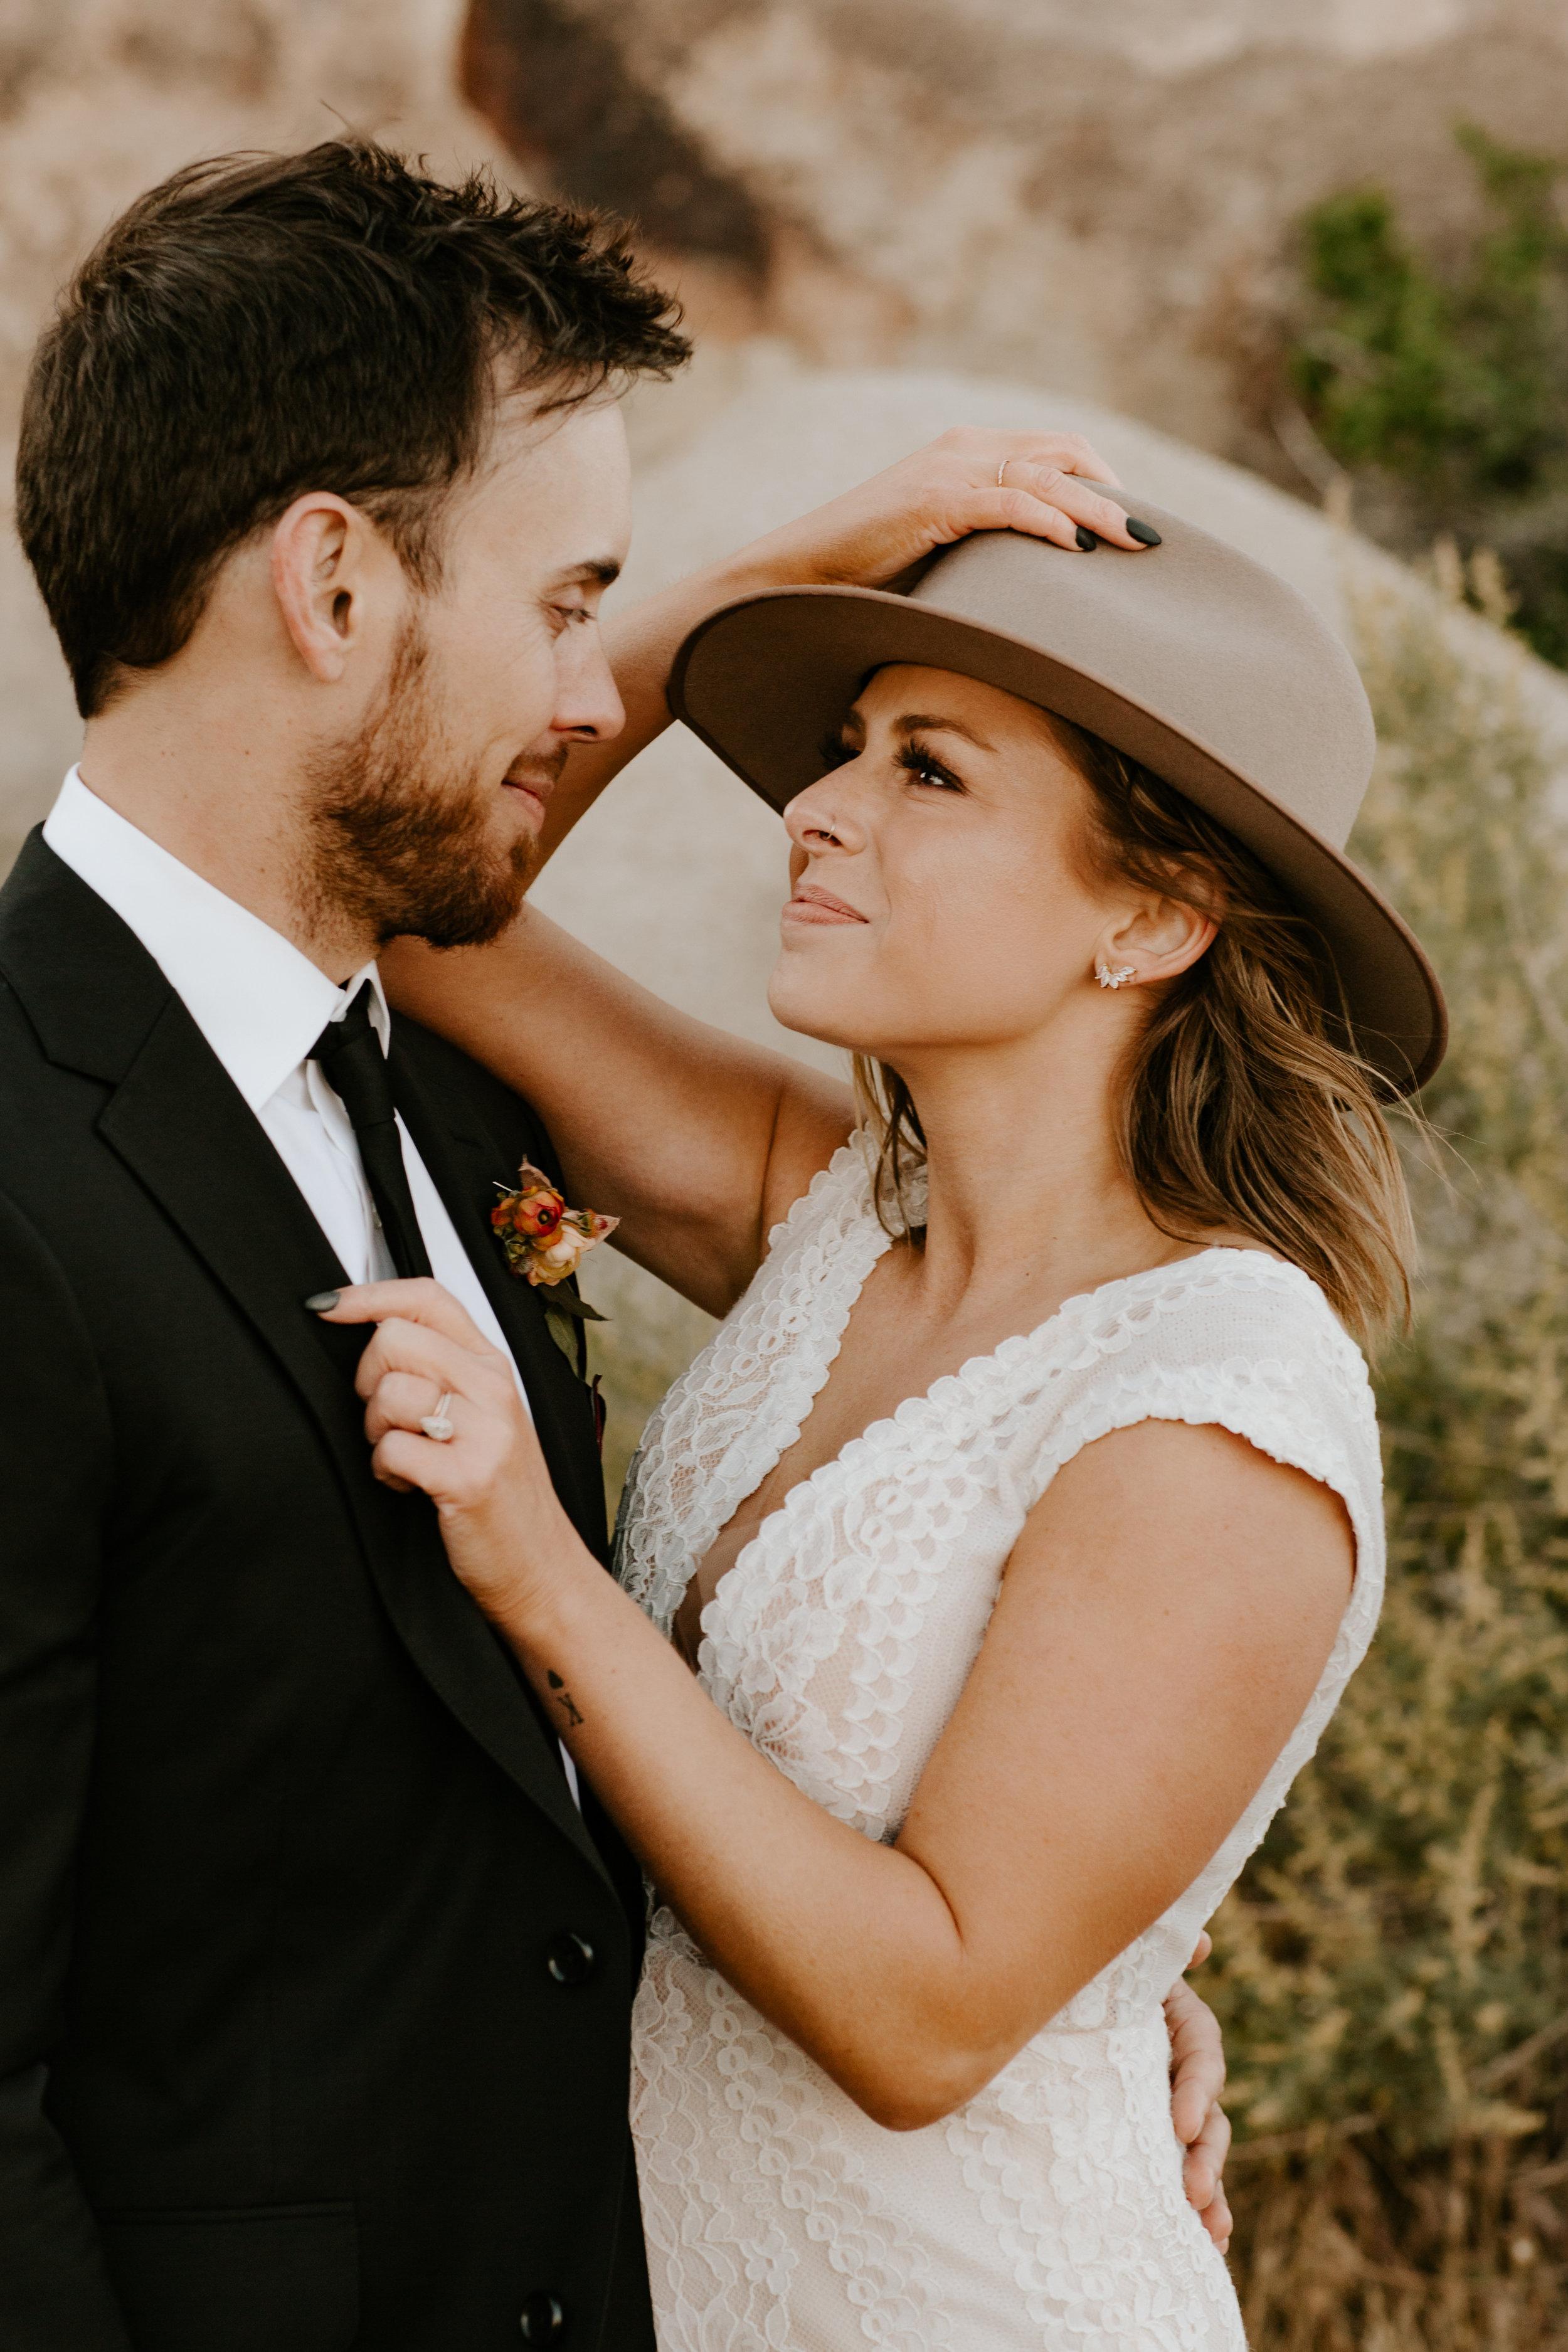 2019-05-26_Callie-Evan_Wedding_Joshua Tree_Paige Nelson_PREVIEWS HR-58.jpg